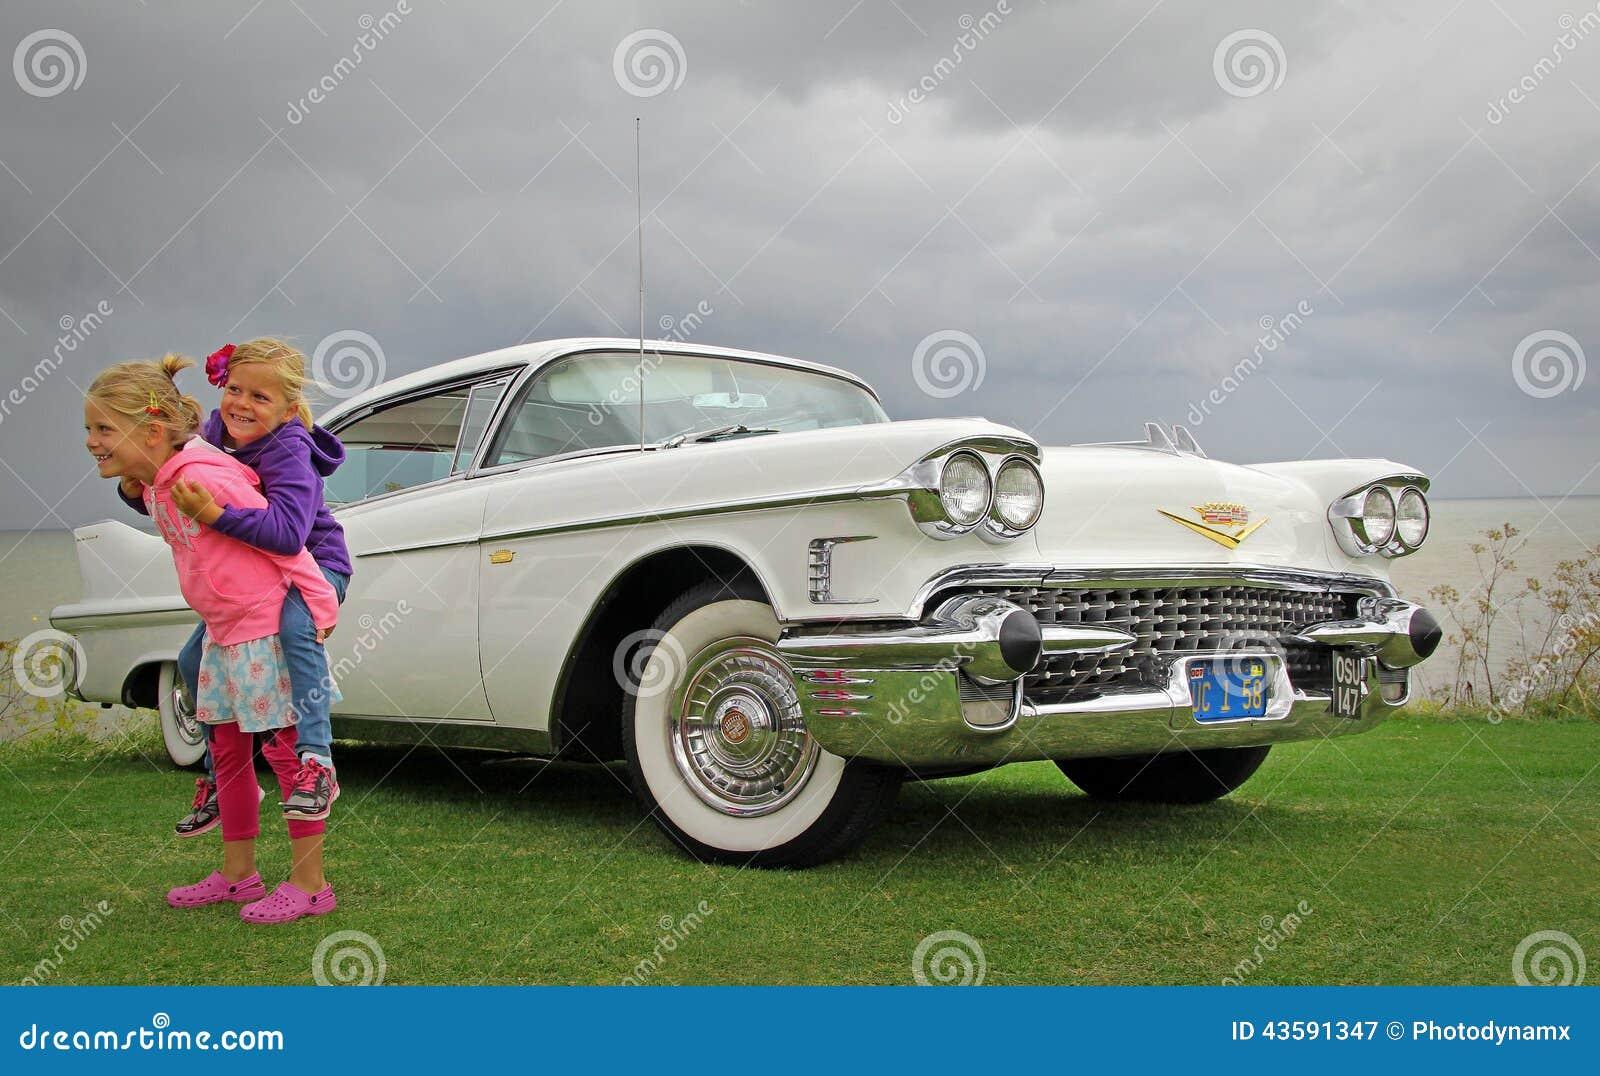 american cadillac car cars children